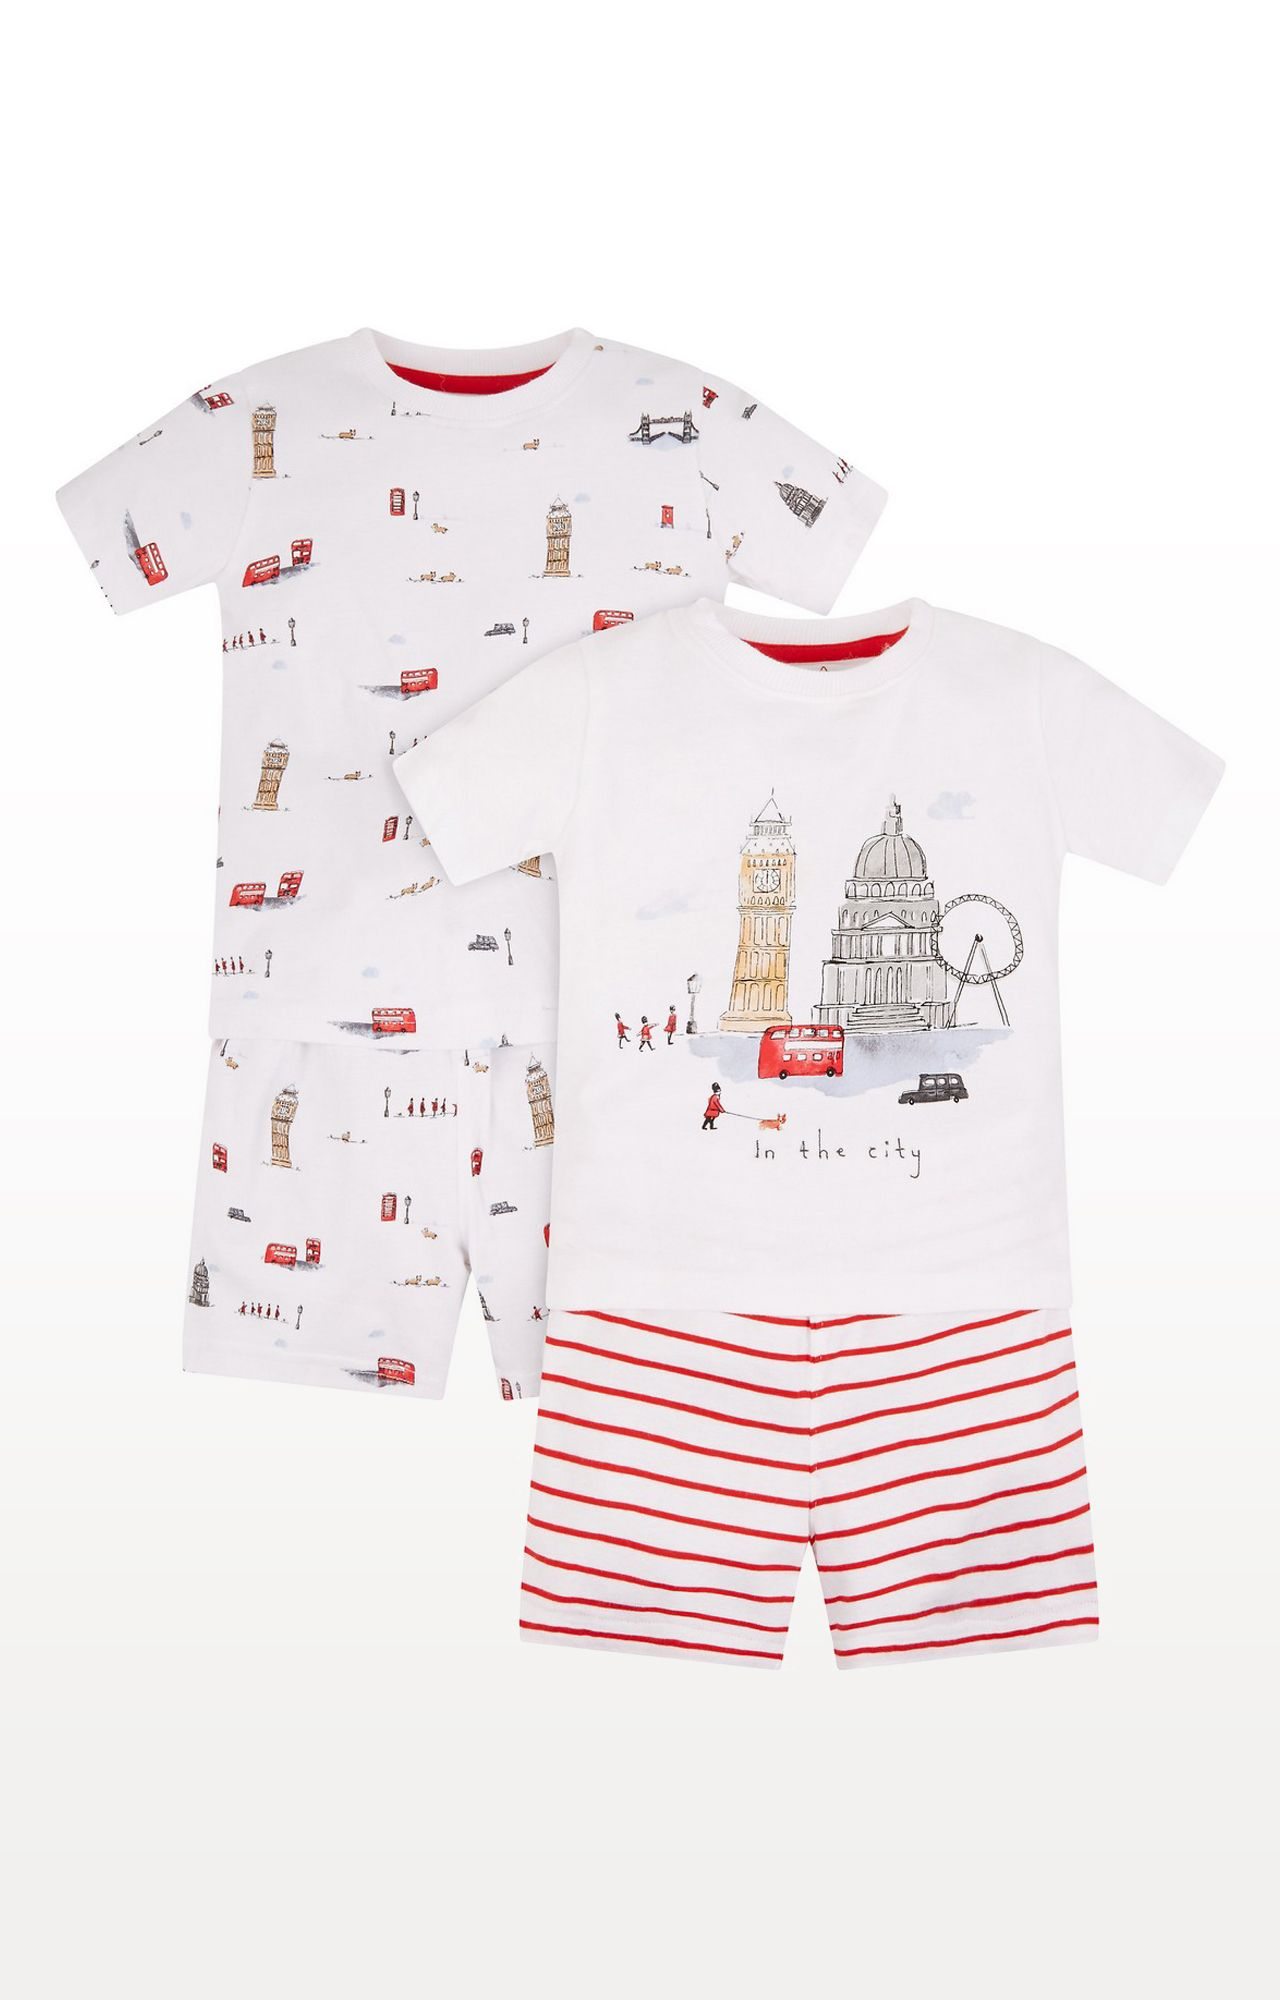 Mothercare | White Printed London Landmarks Shortie Pyjamas - Pack of 2